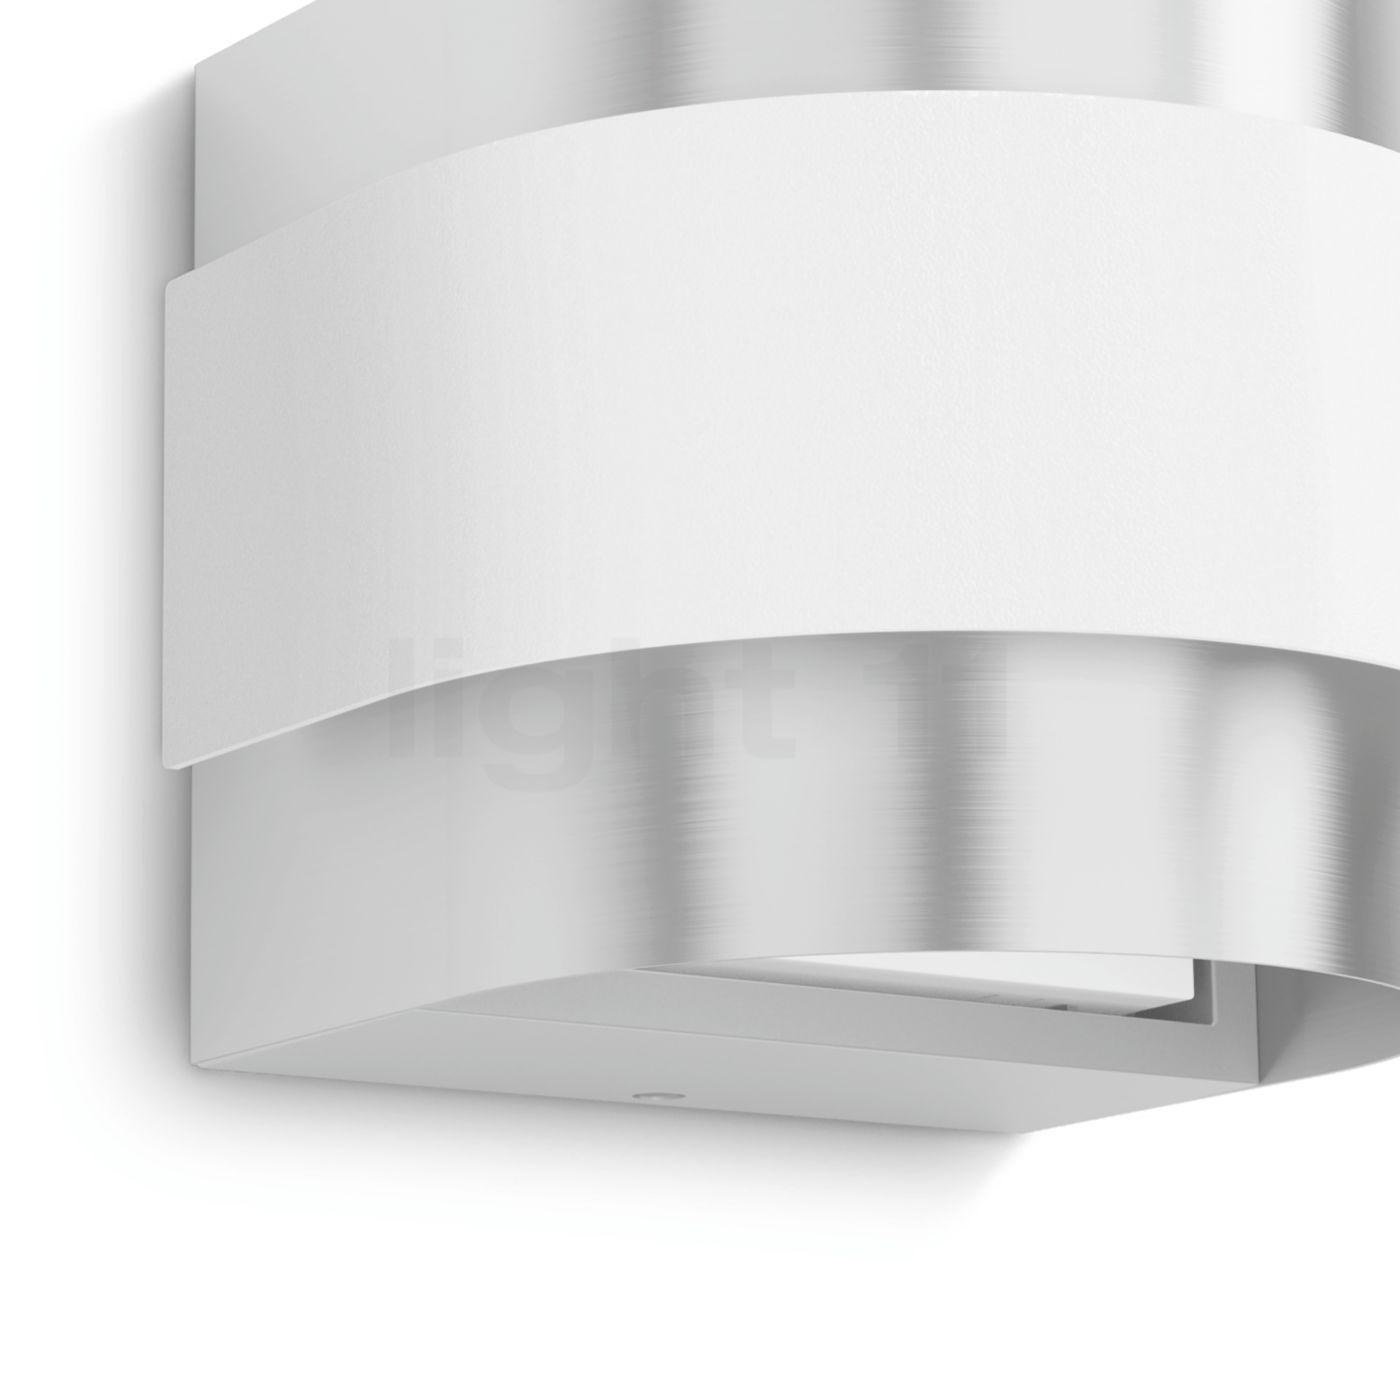 Philips Myliving Drava Wall light LED Wall lights